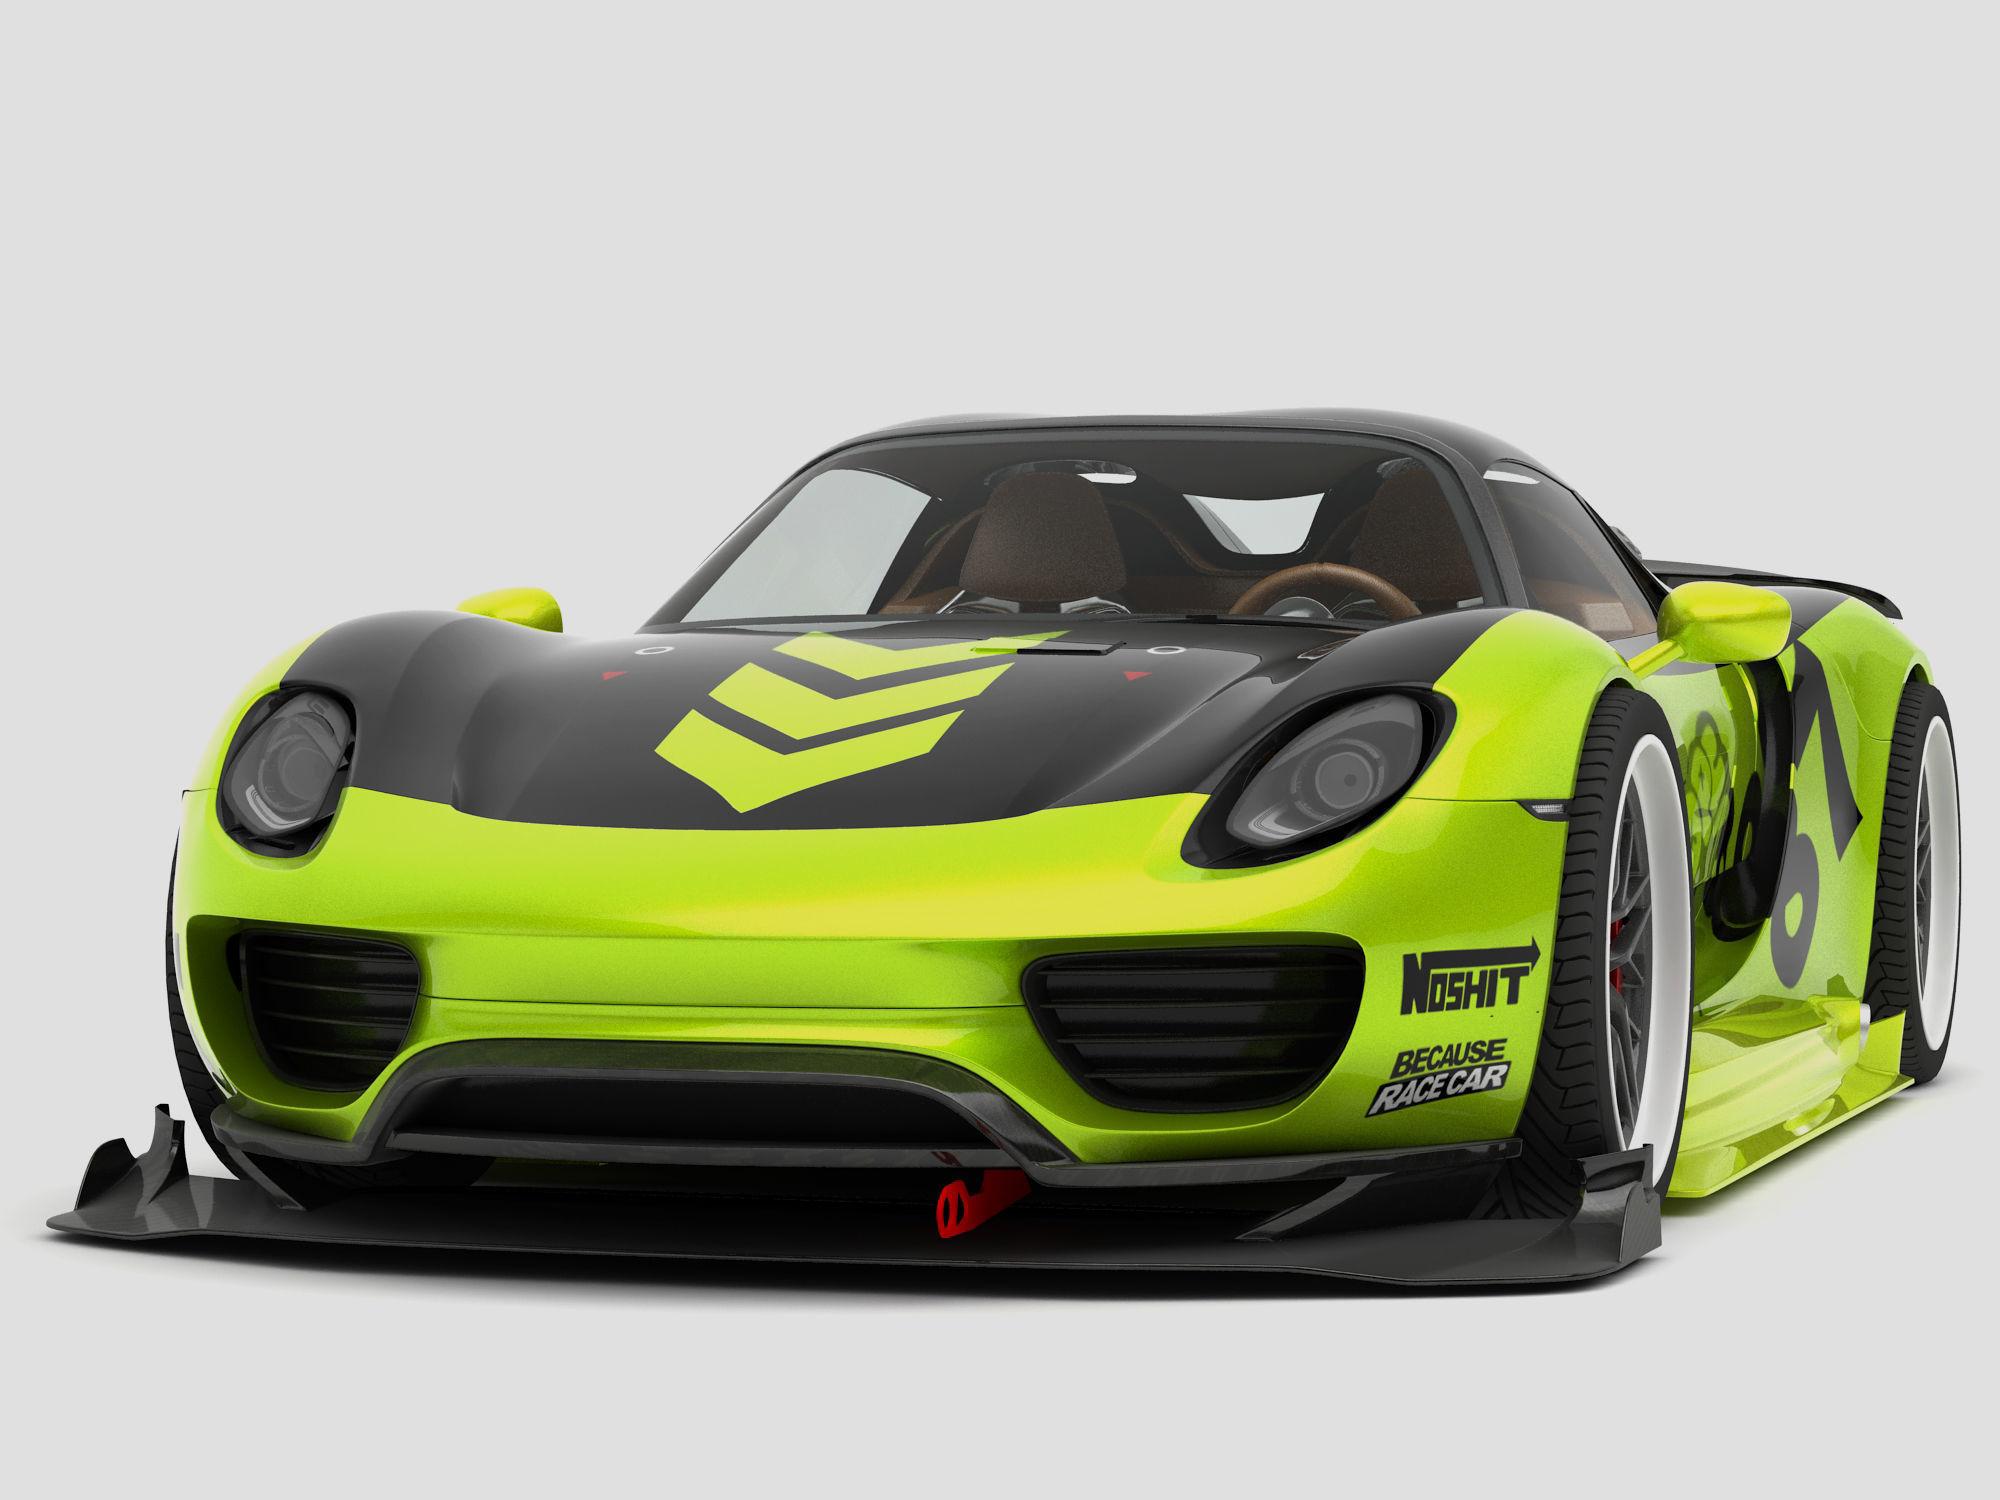 Chimera One Porsche 918 Street race concept